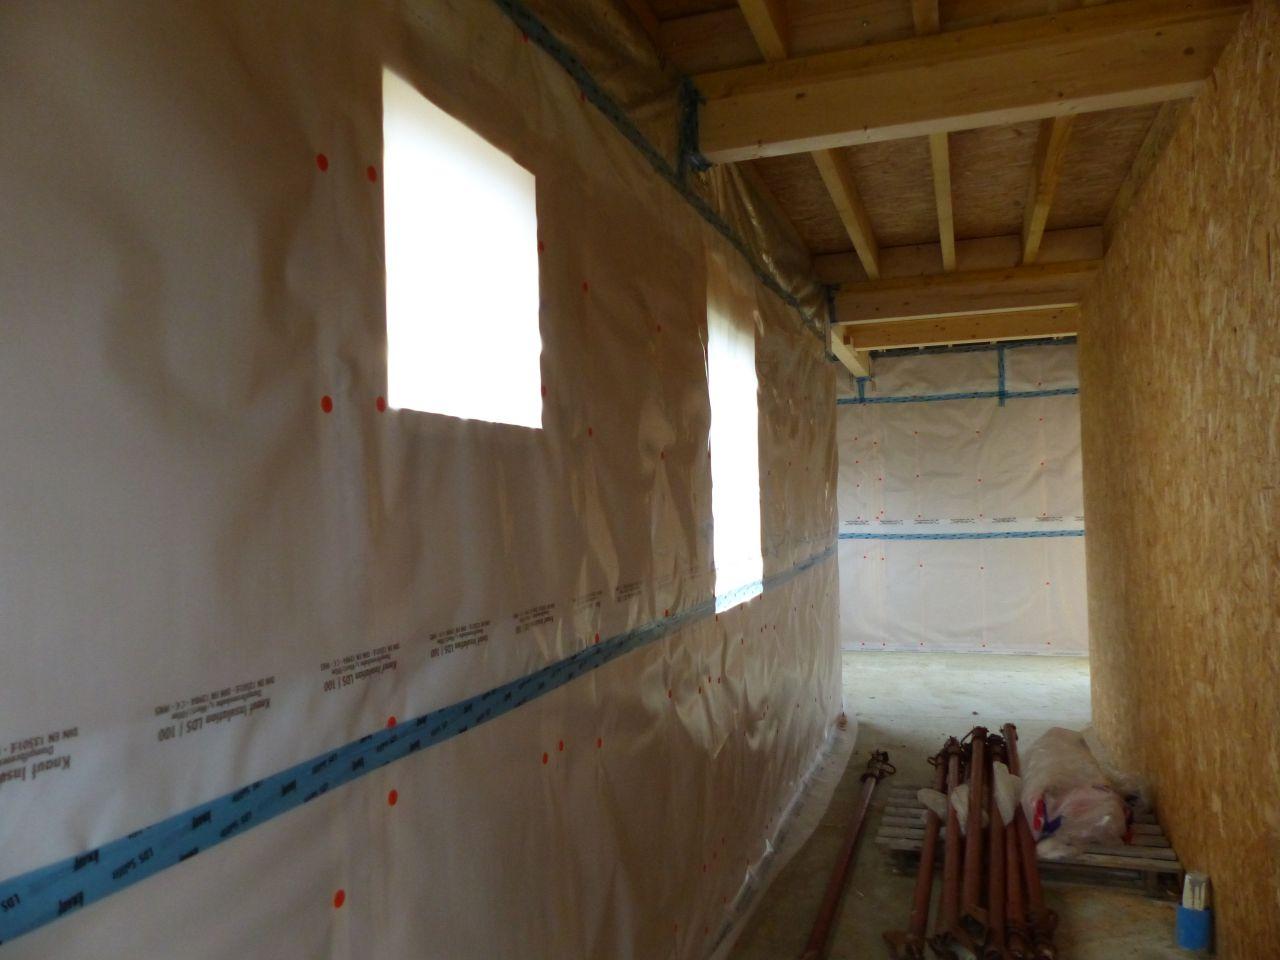 Photo isolation int rieure laine de bois isolation for Isolation interieur